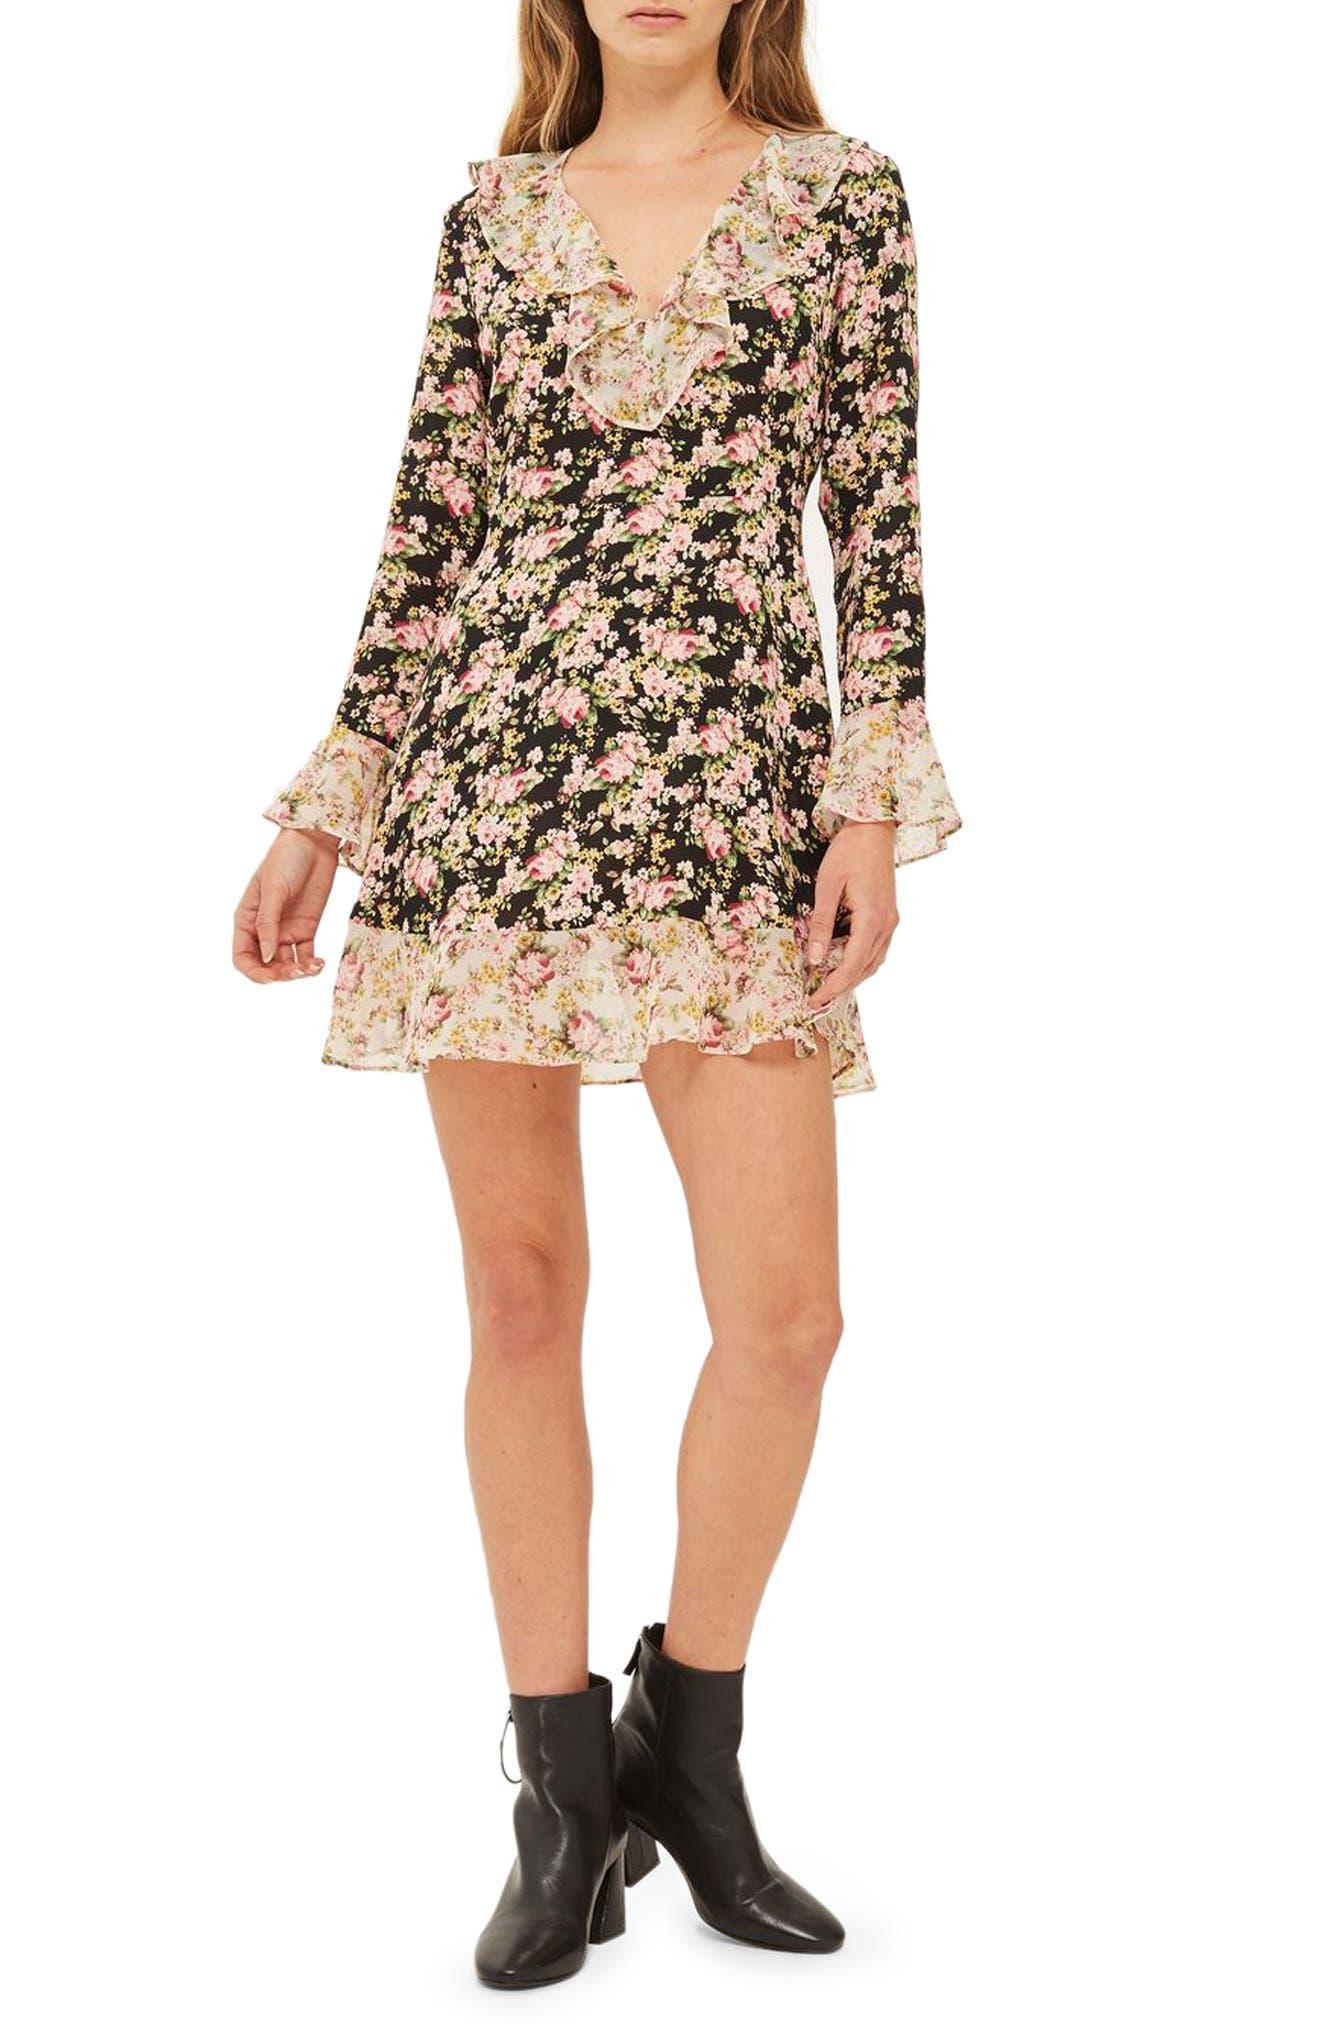 Topshop True Romance Ruffle Minidress (Petite)